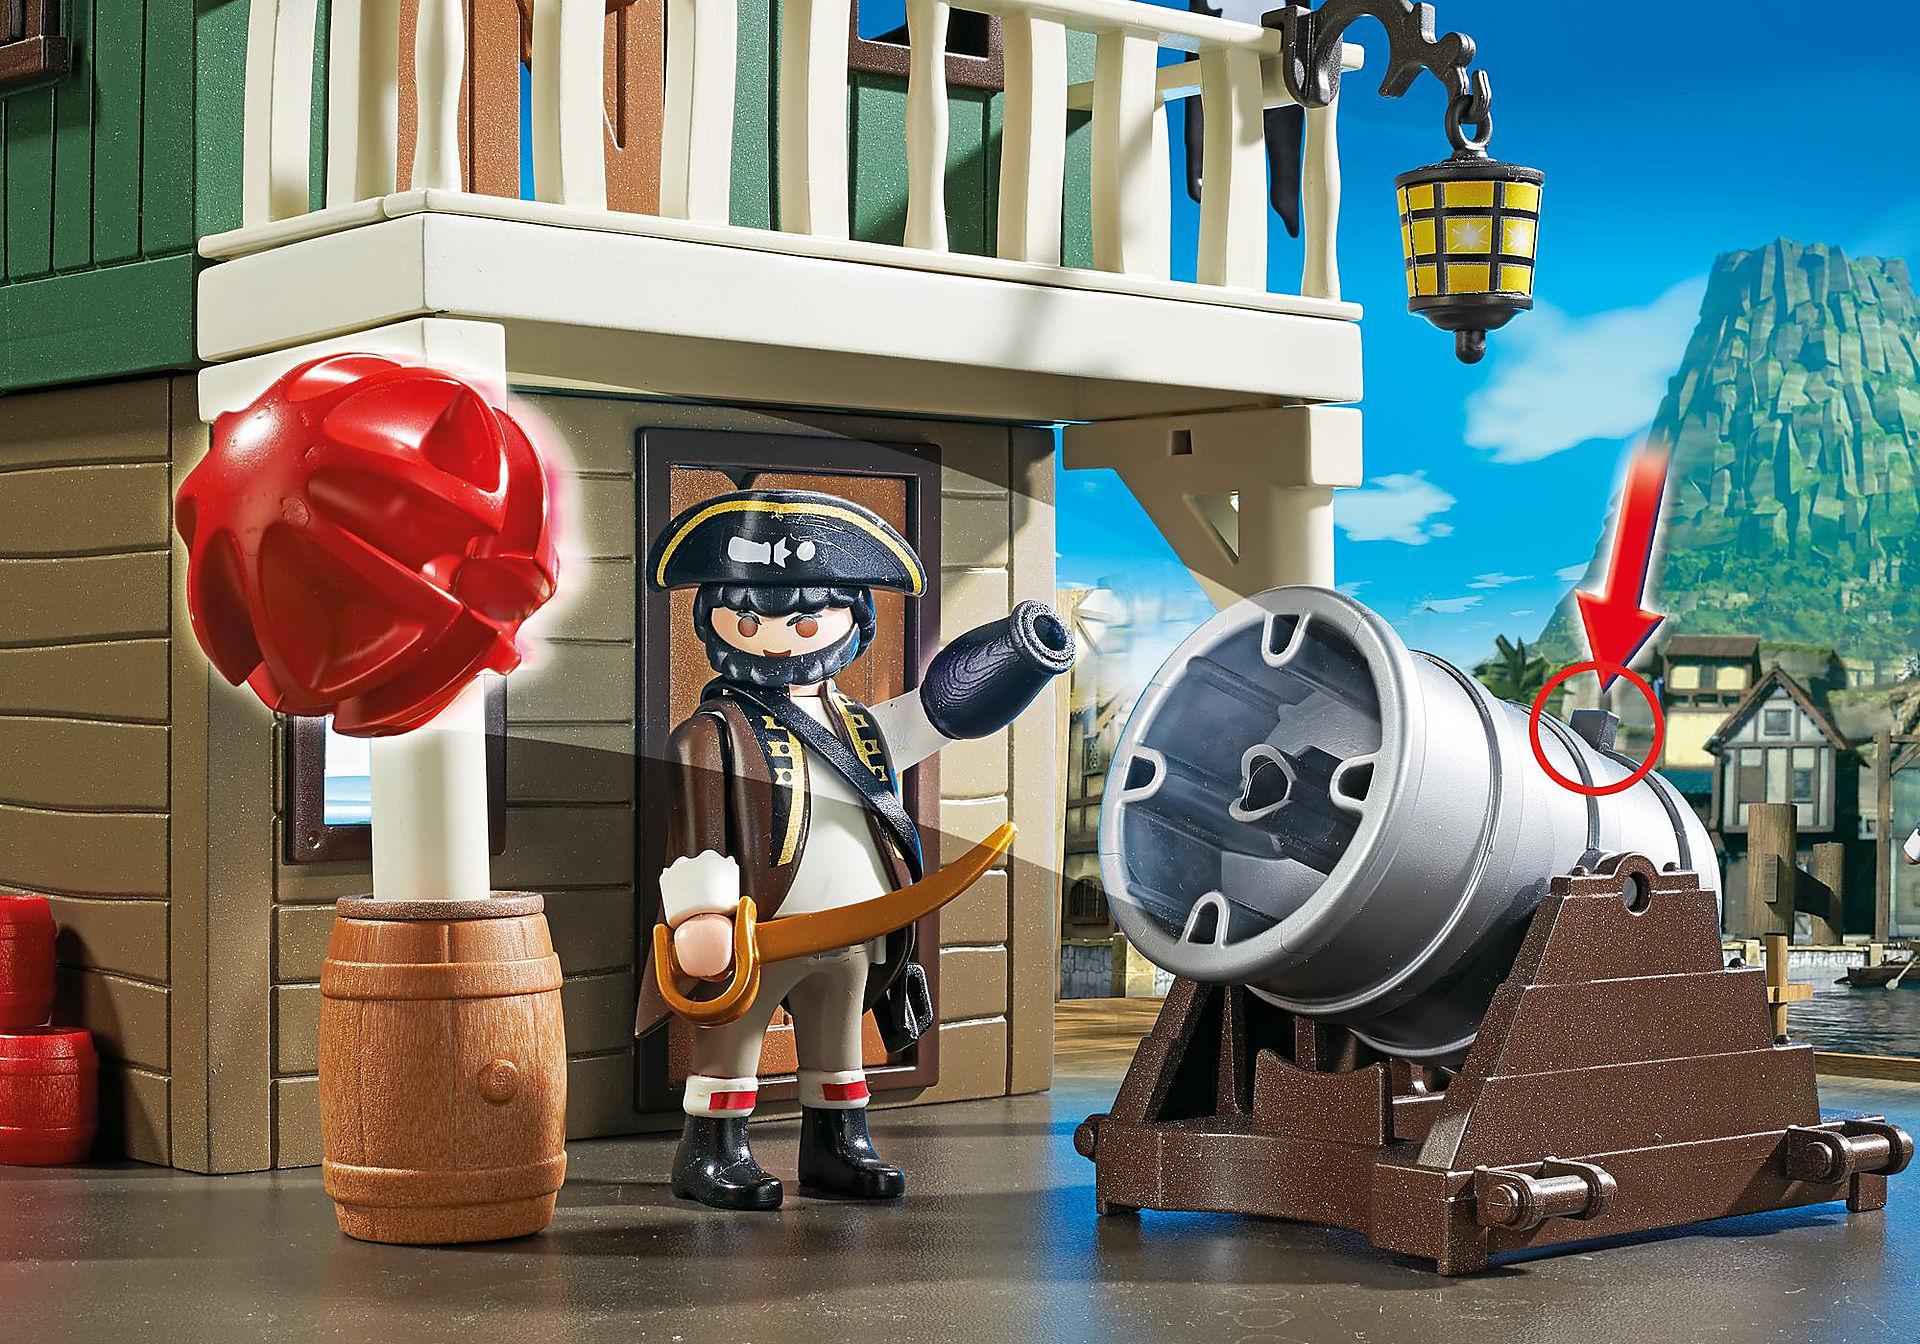 http://media.playmobil.com/i/playmobil/4796_product_extra1/Замаскированный Пиратский Форт с Руби